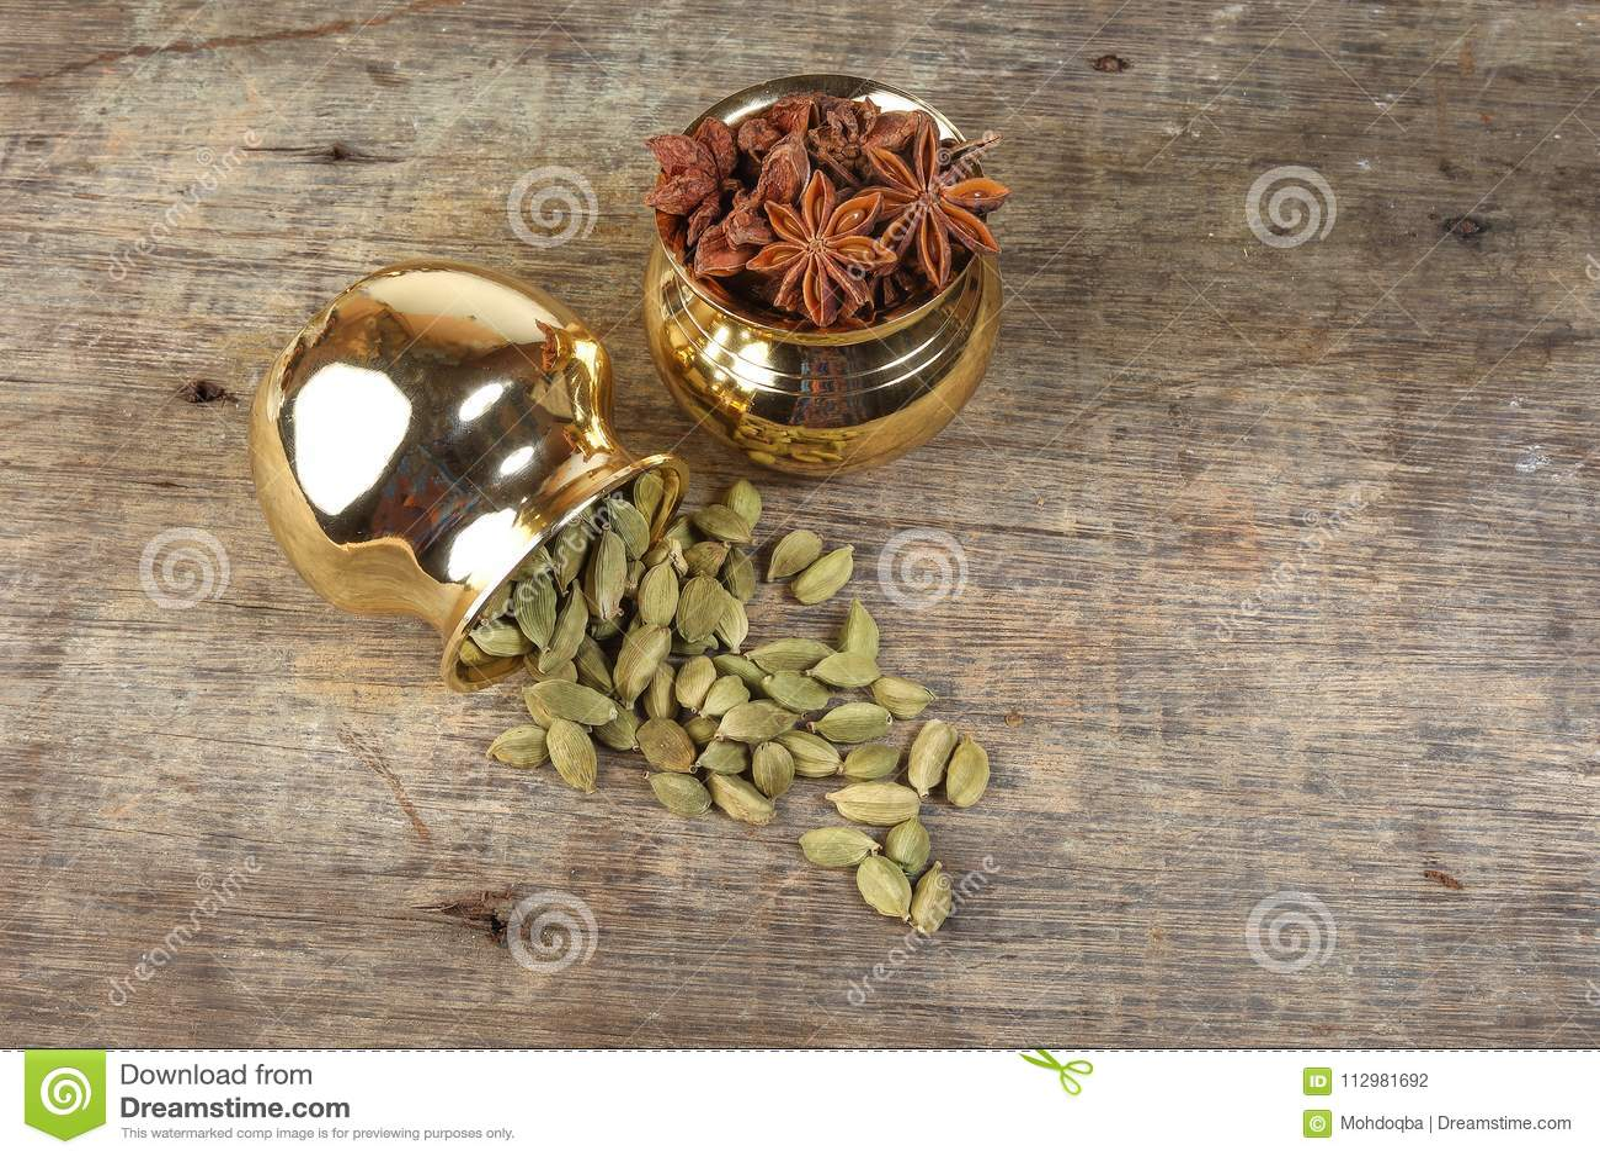 Star Anise Cardamom spice in golden metal pot